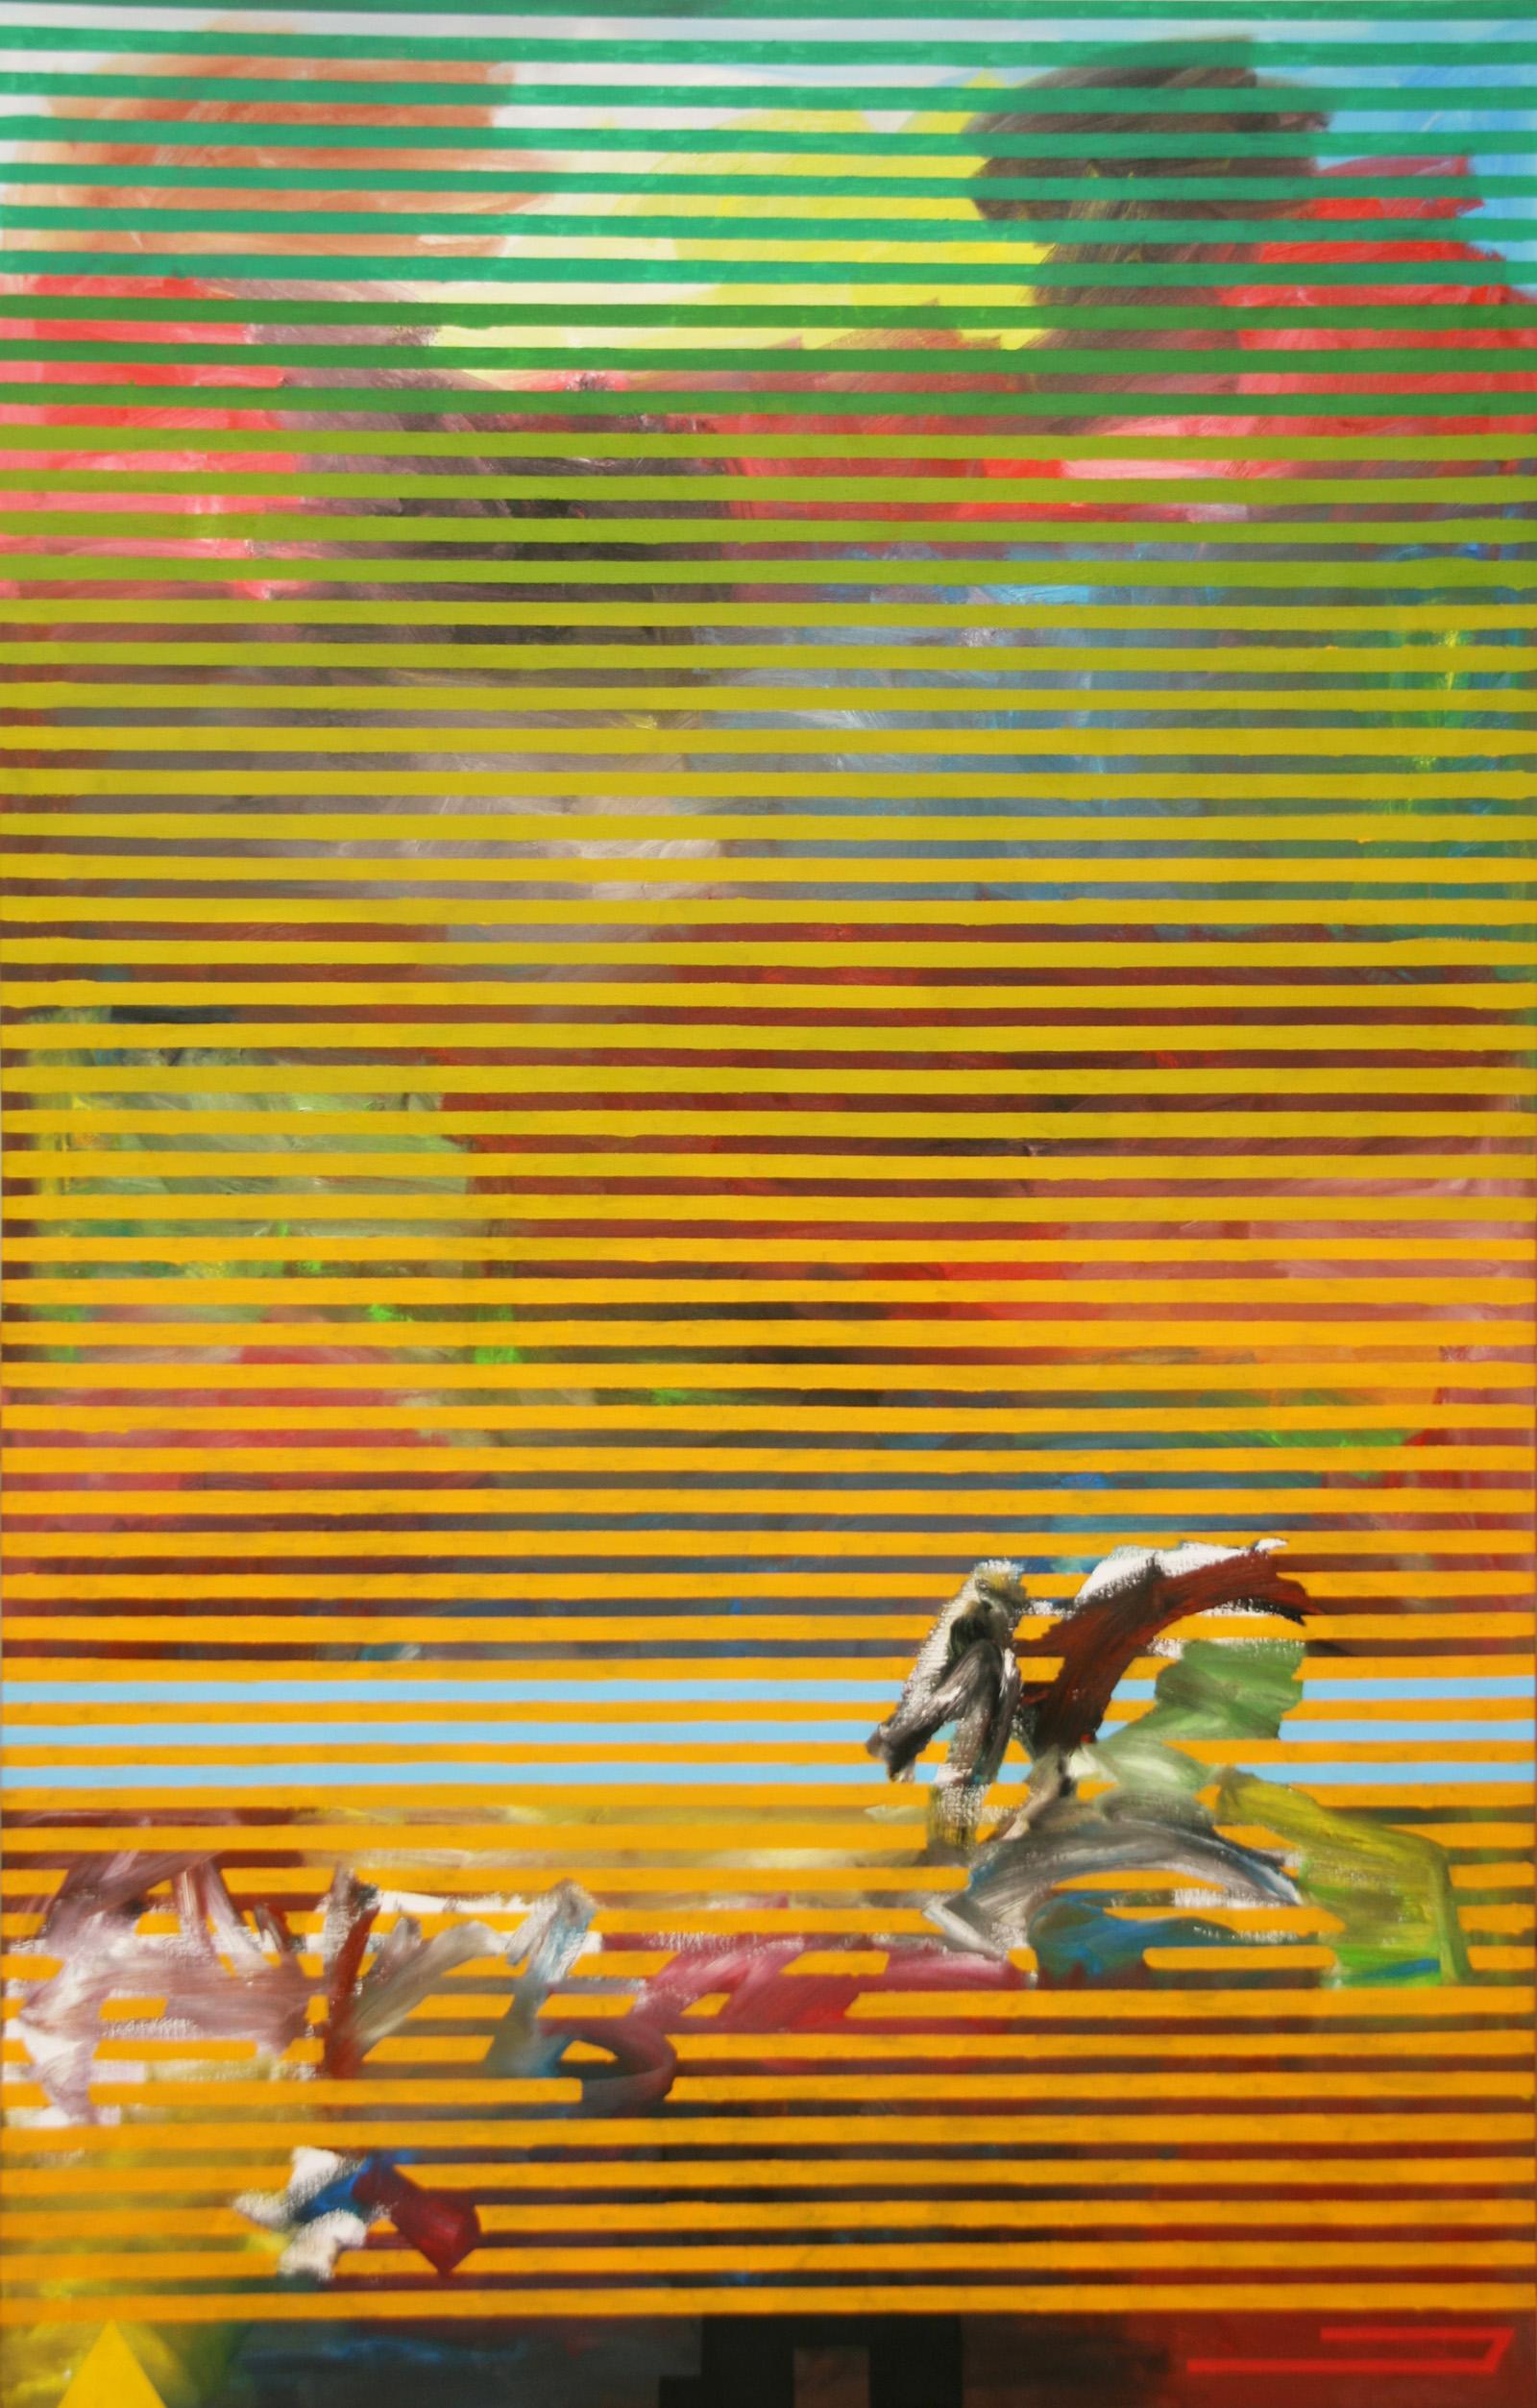 Retorn -oil on canvas 228 x 146 cm- 2016 Miquel Gelabert